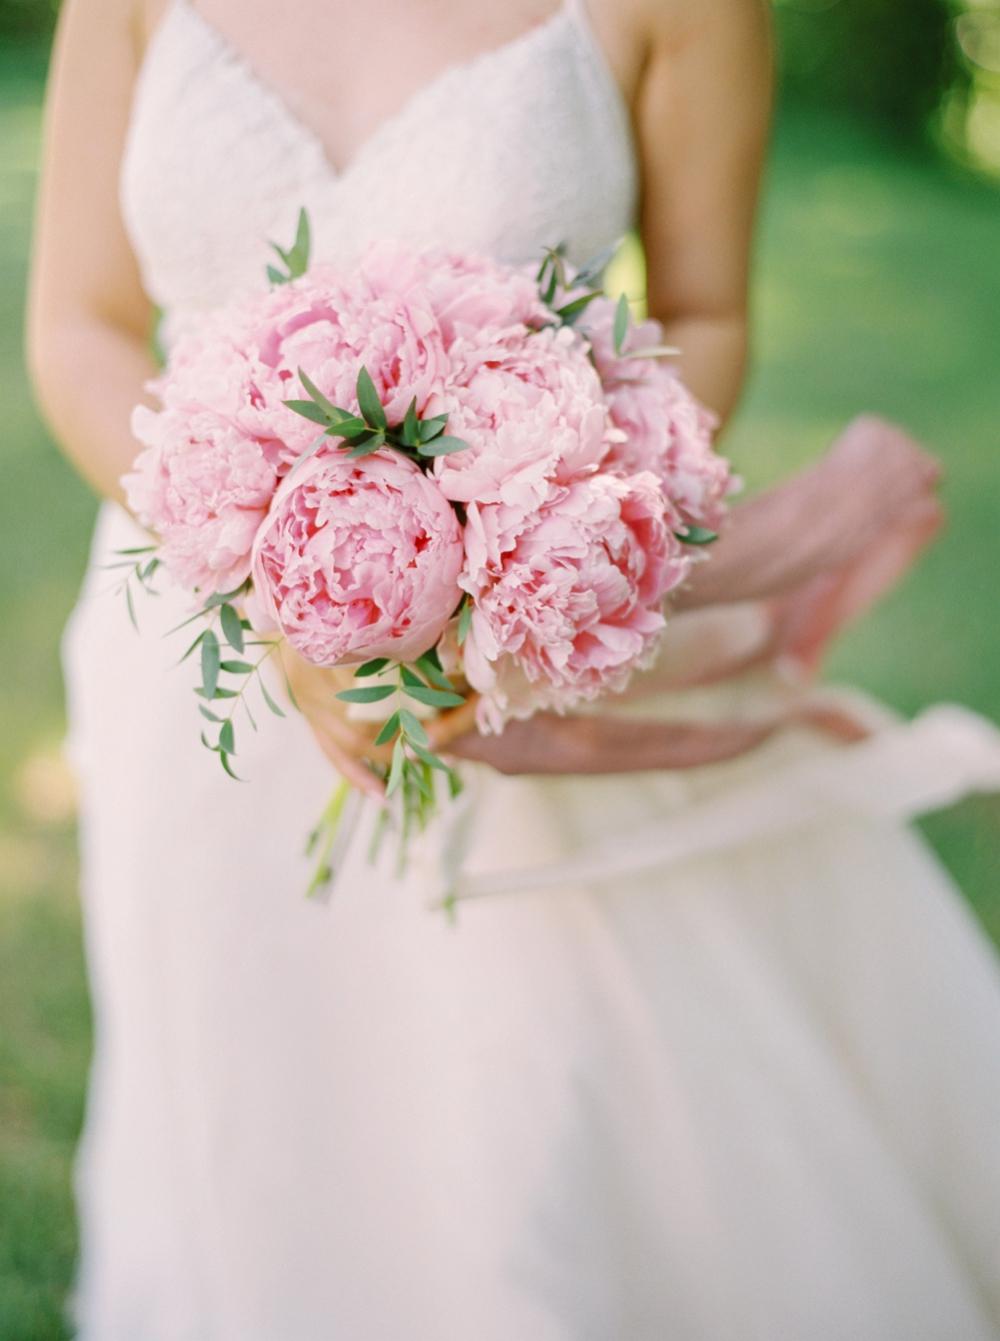 Bridal portrait pink peony bouquet | BHLDN wedding dress | Justine milton fine art wedding photographers | calgary wedding at the lake house